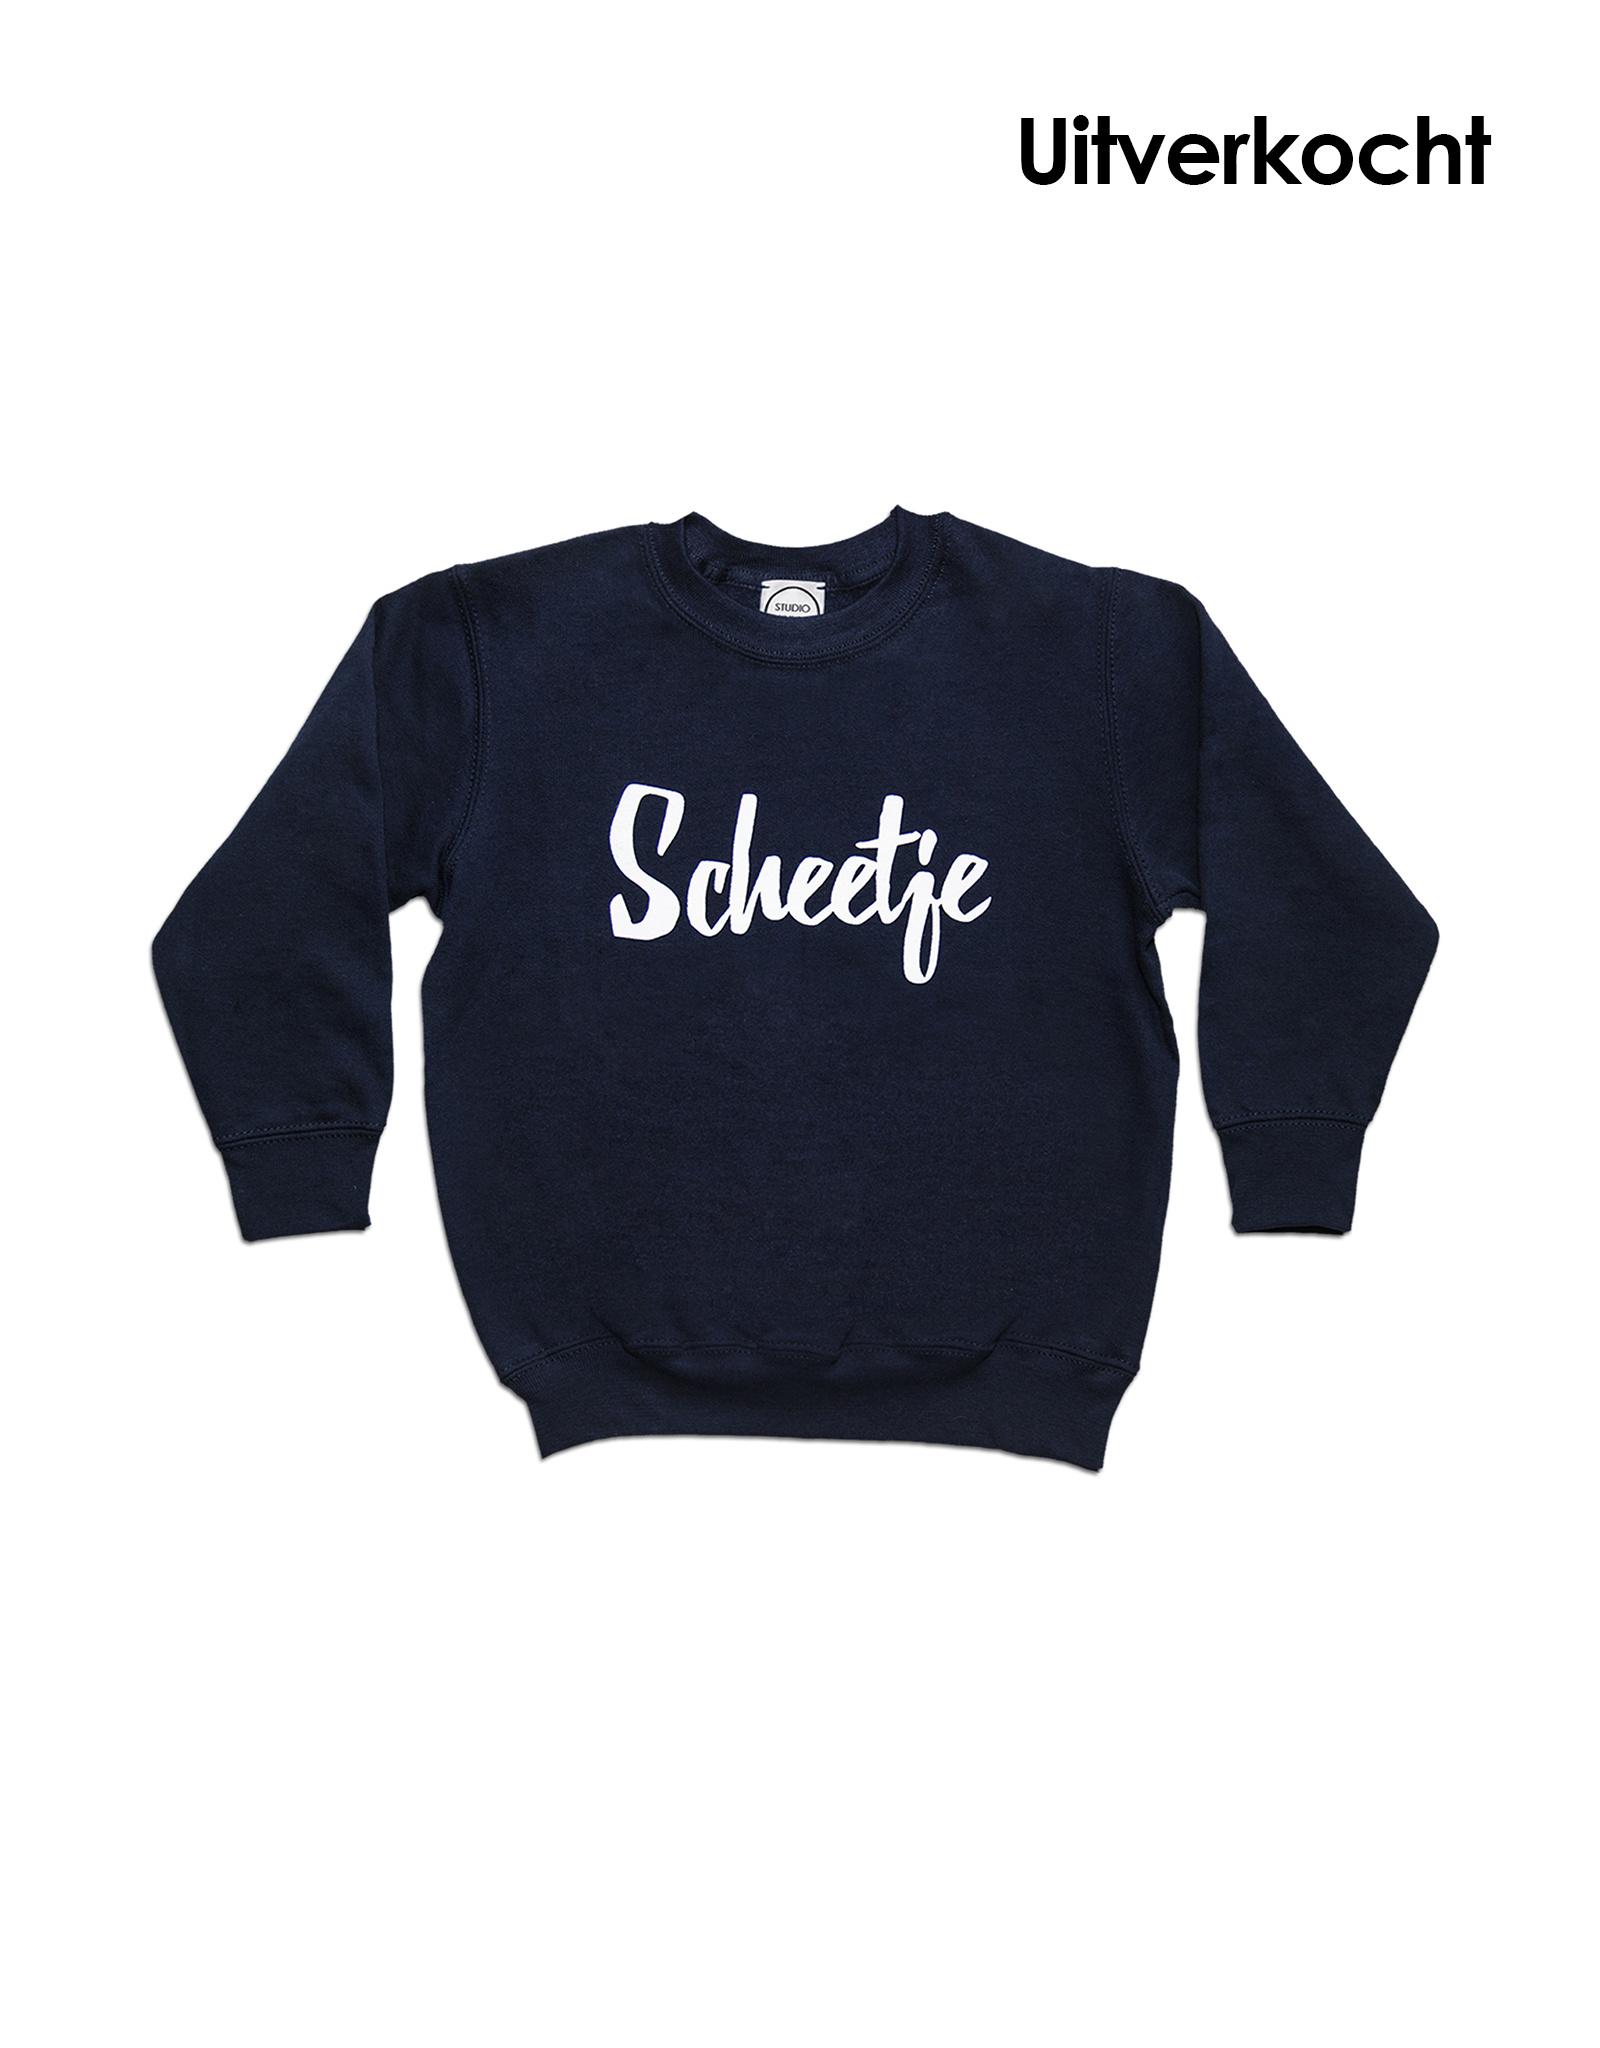 Studio Mini-Me Scheetje Sweater kind